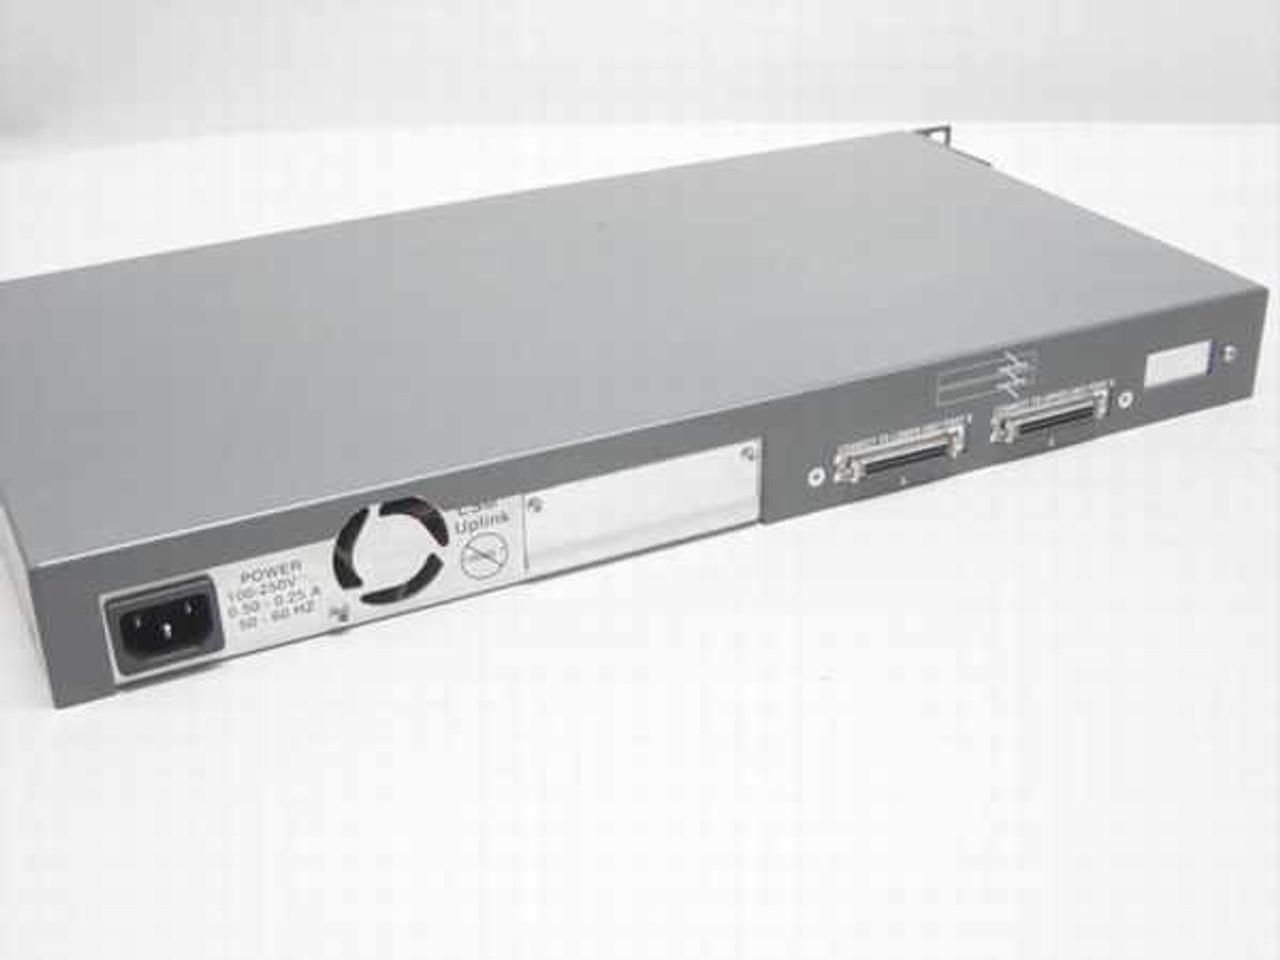 10Mb smc smc3312tc 12 port smc tigerstack 3312tc 10mb hub